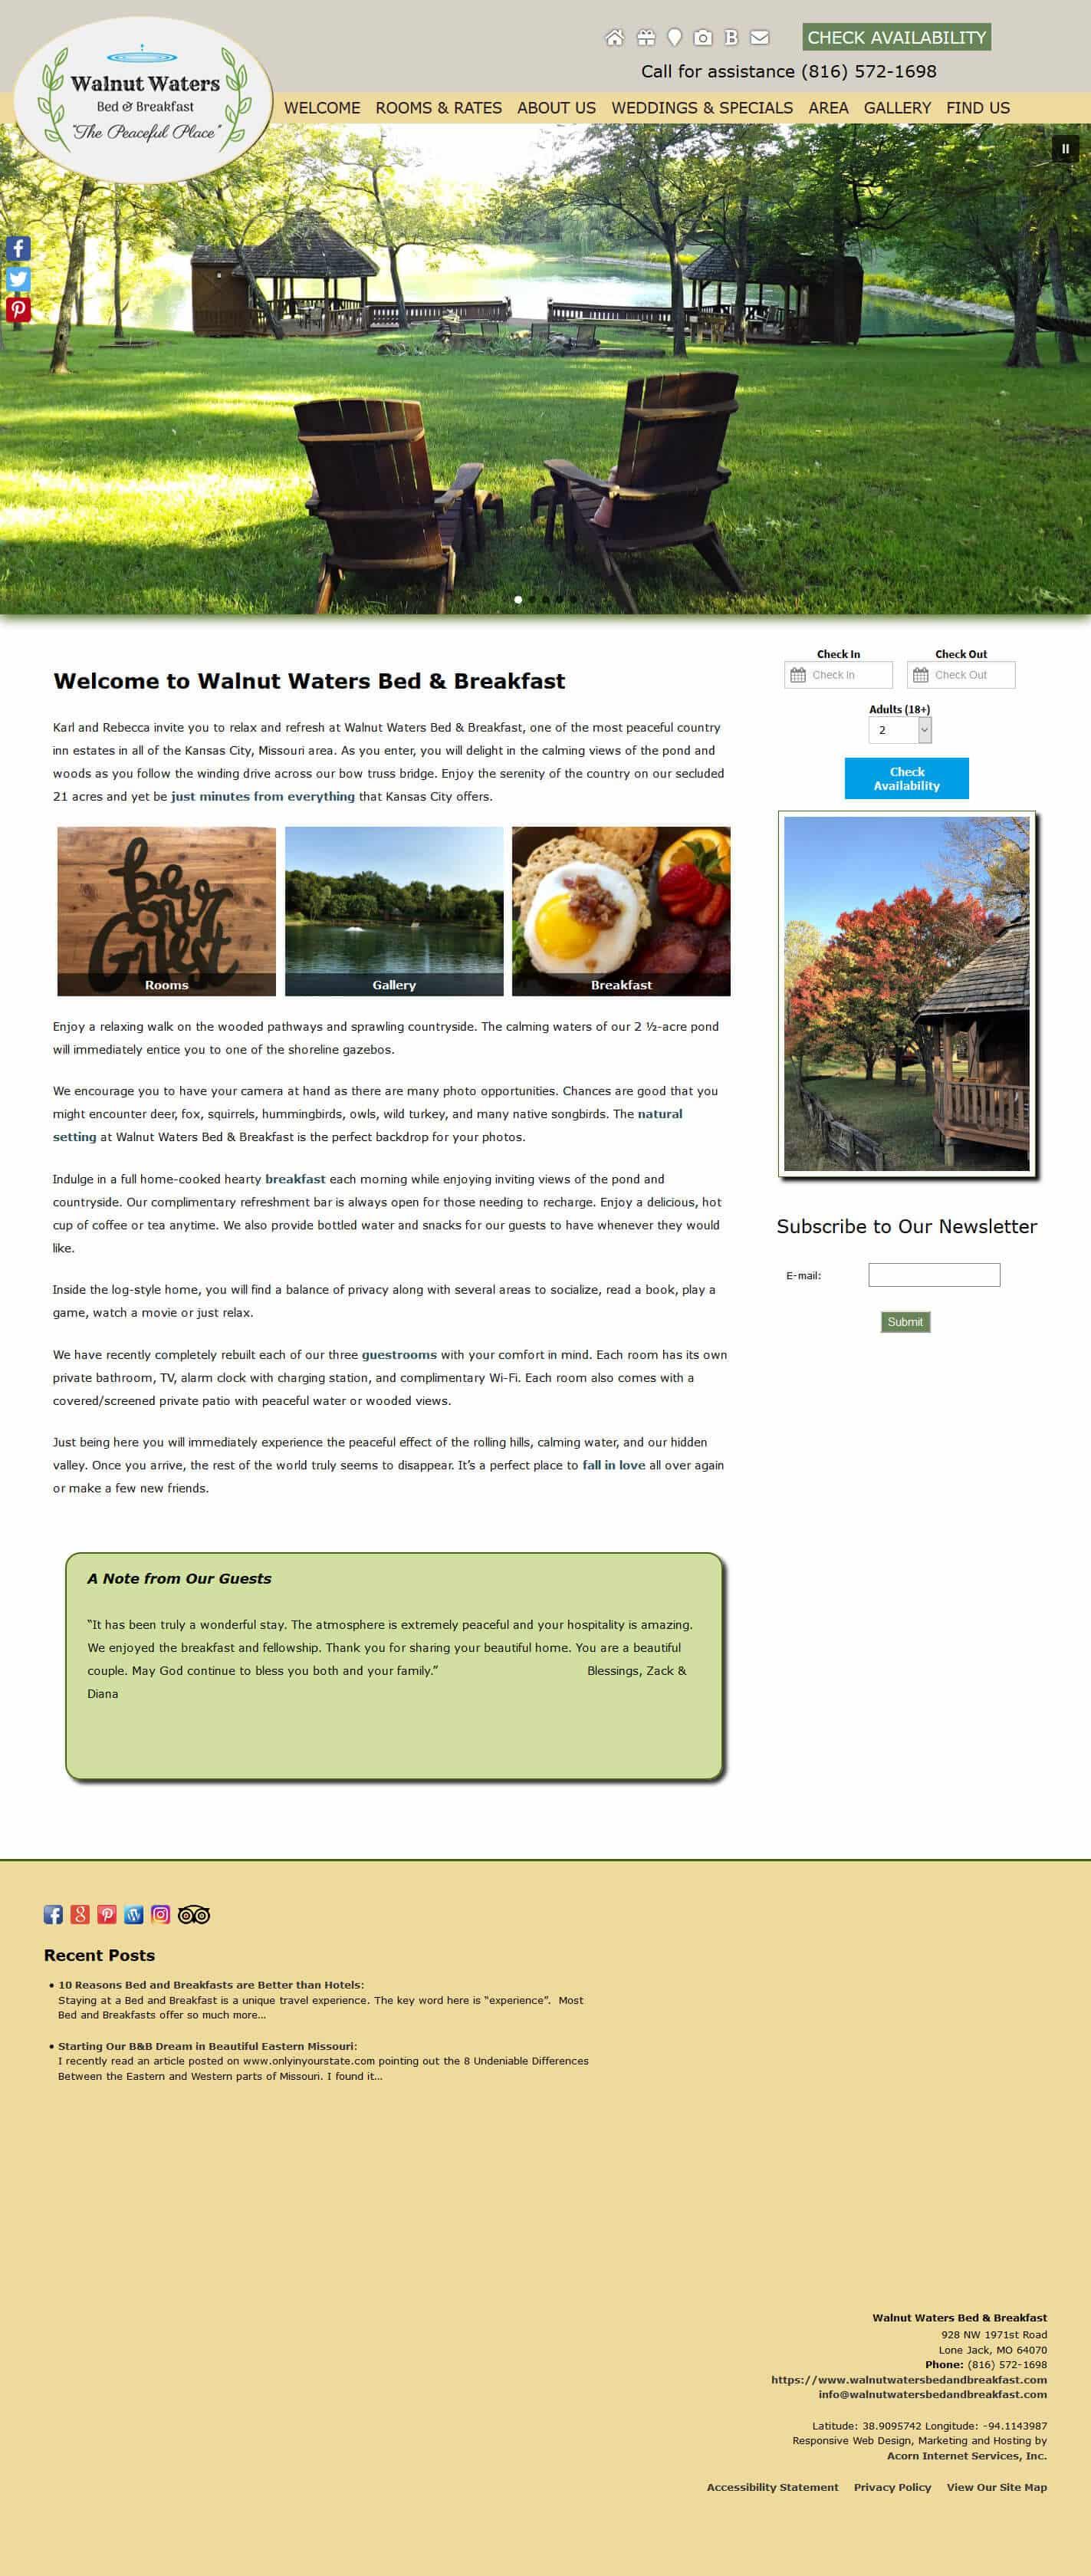 Walnut Waters Bed & Breakfast website home page